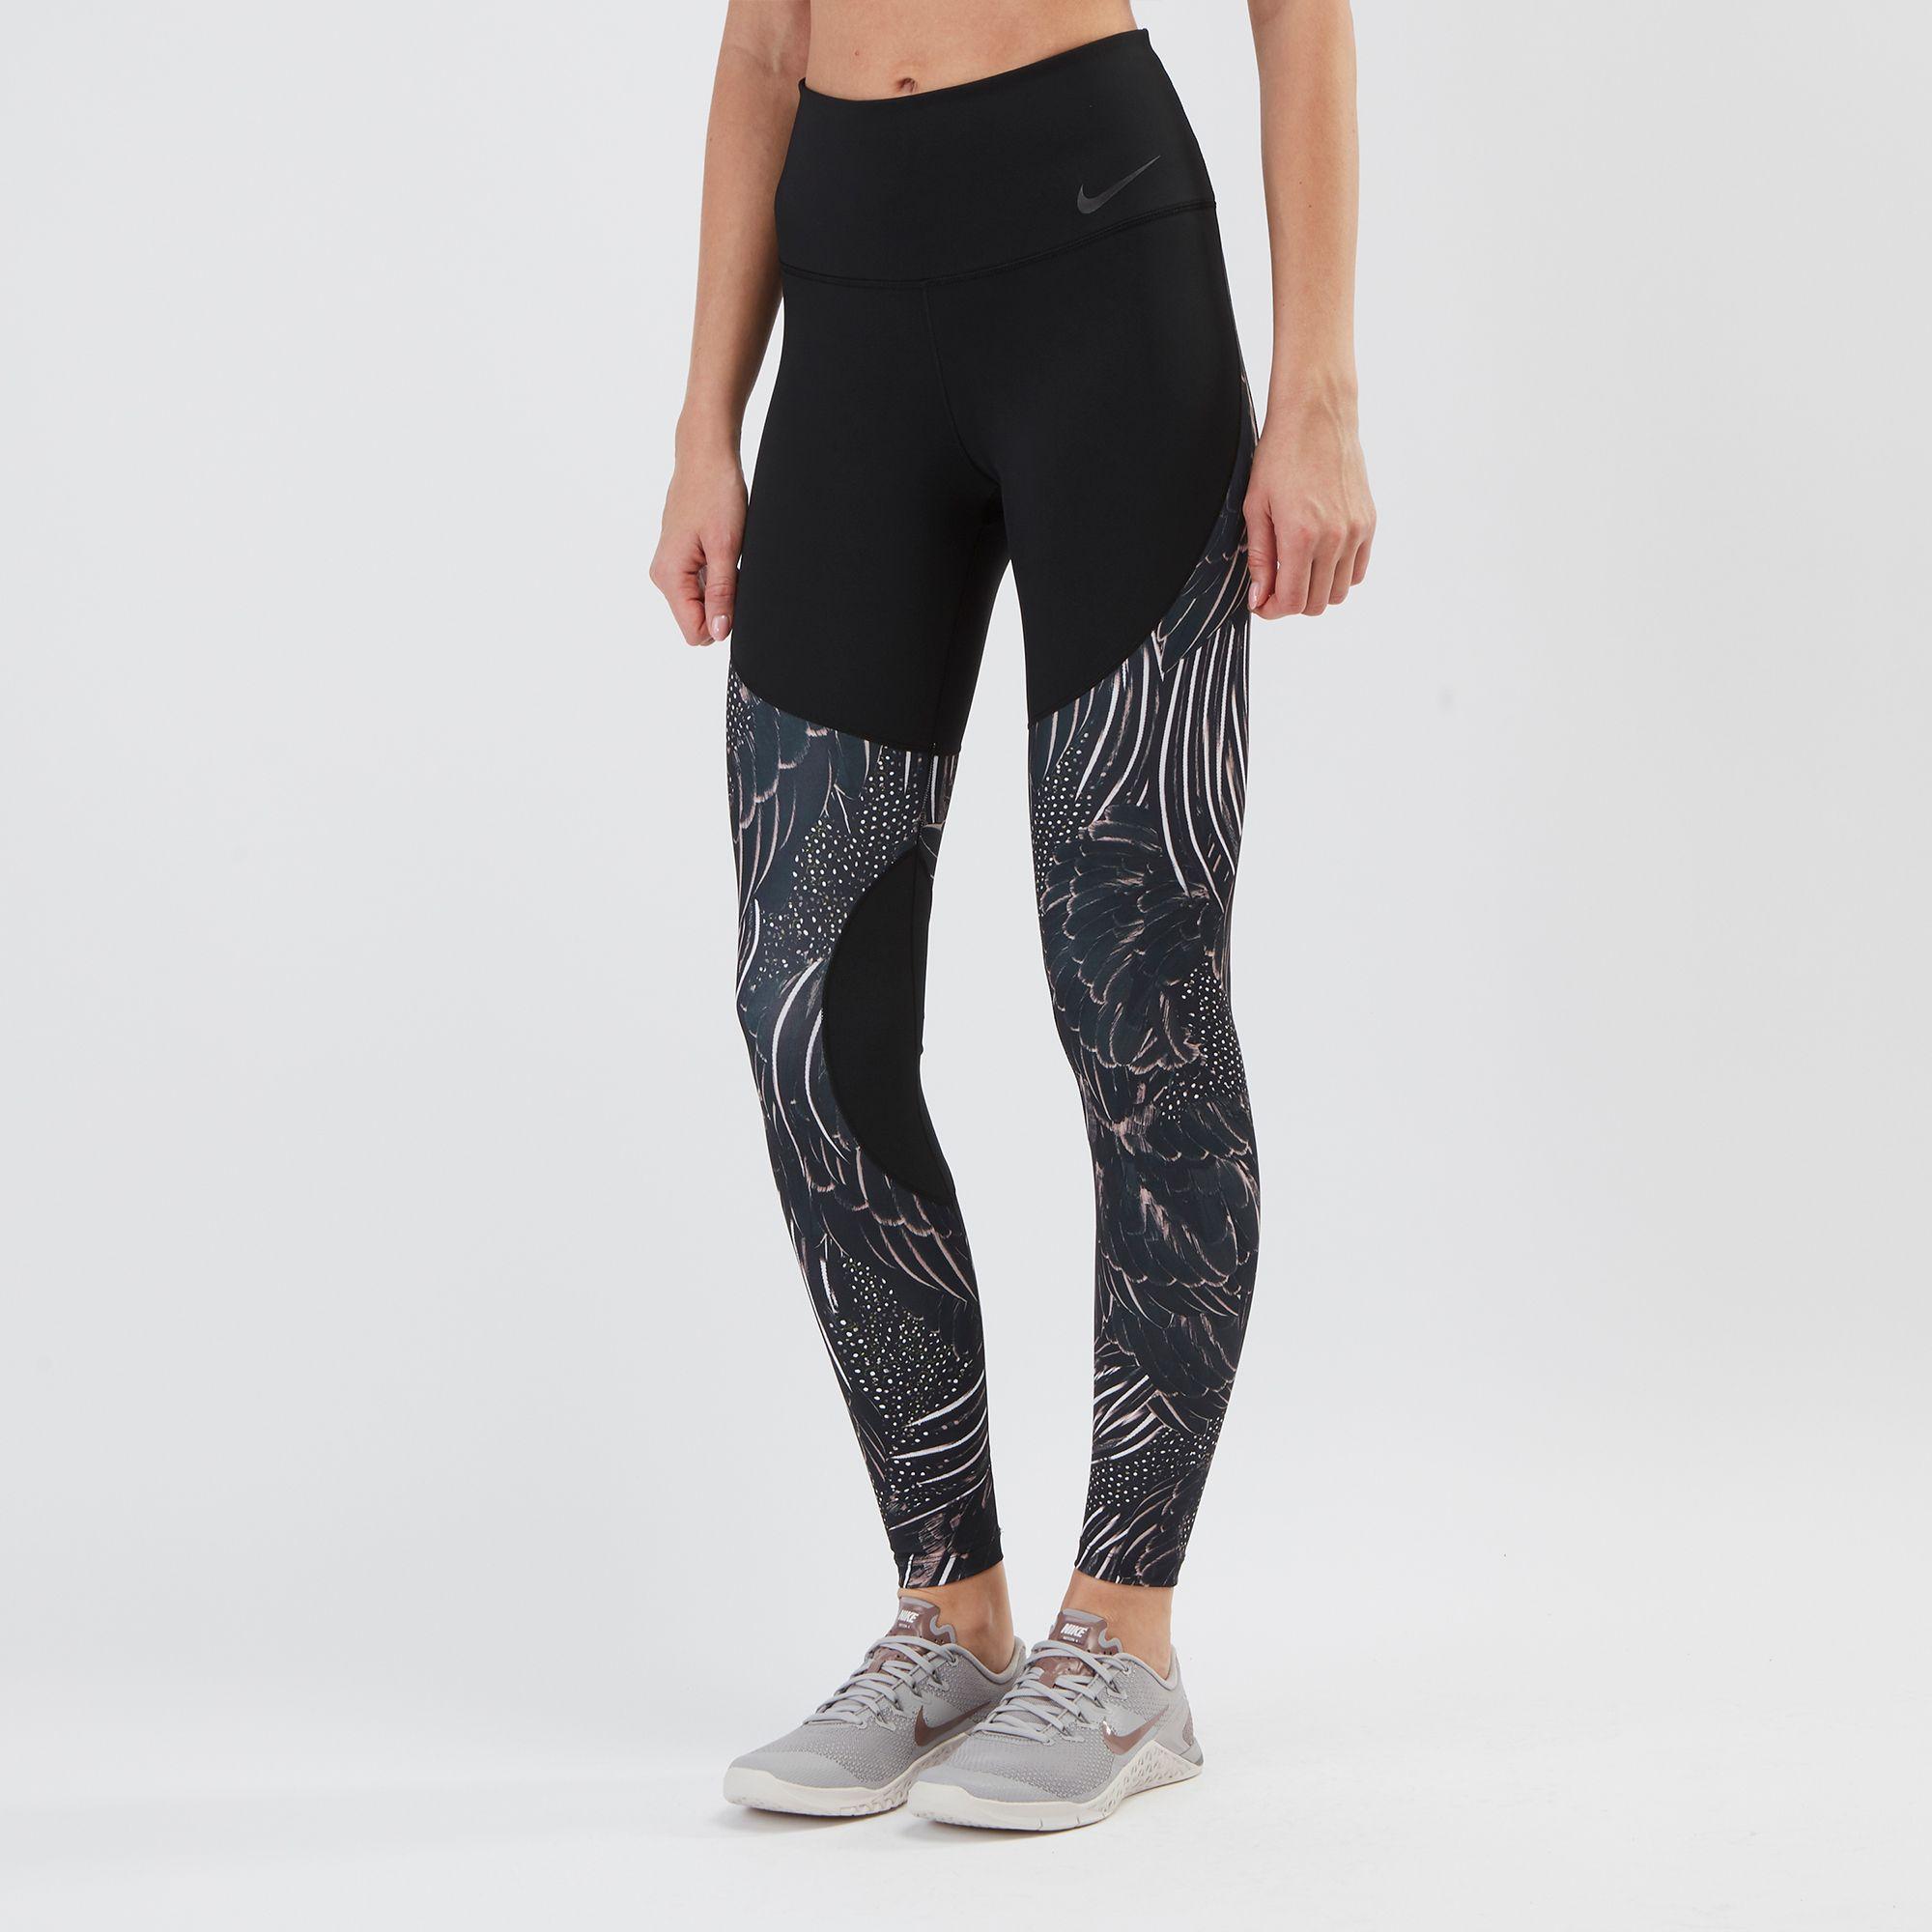 huge discount 2c284 aa919 Nike Dri-FIT Power Training Leggings   Full Length Leggings ...